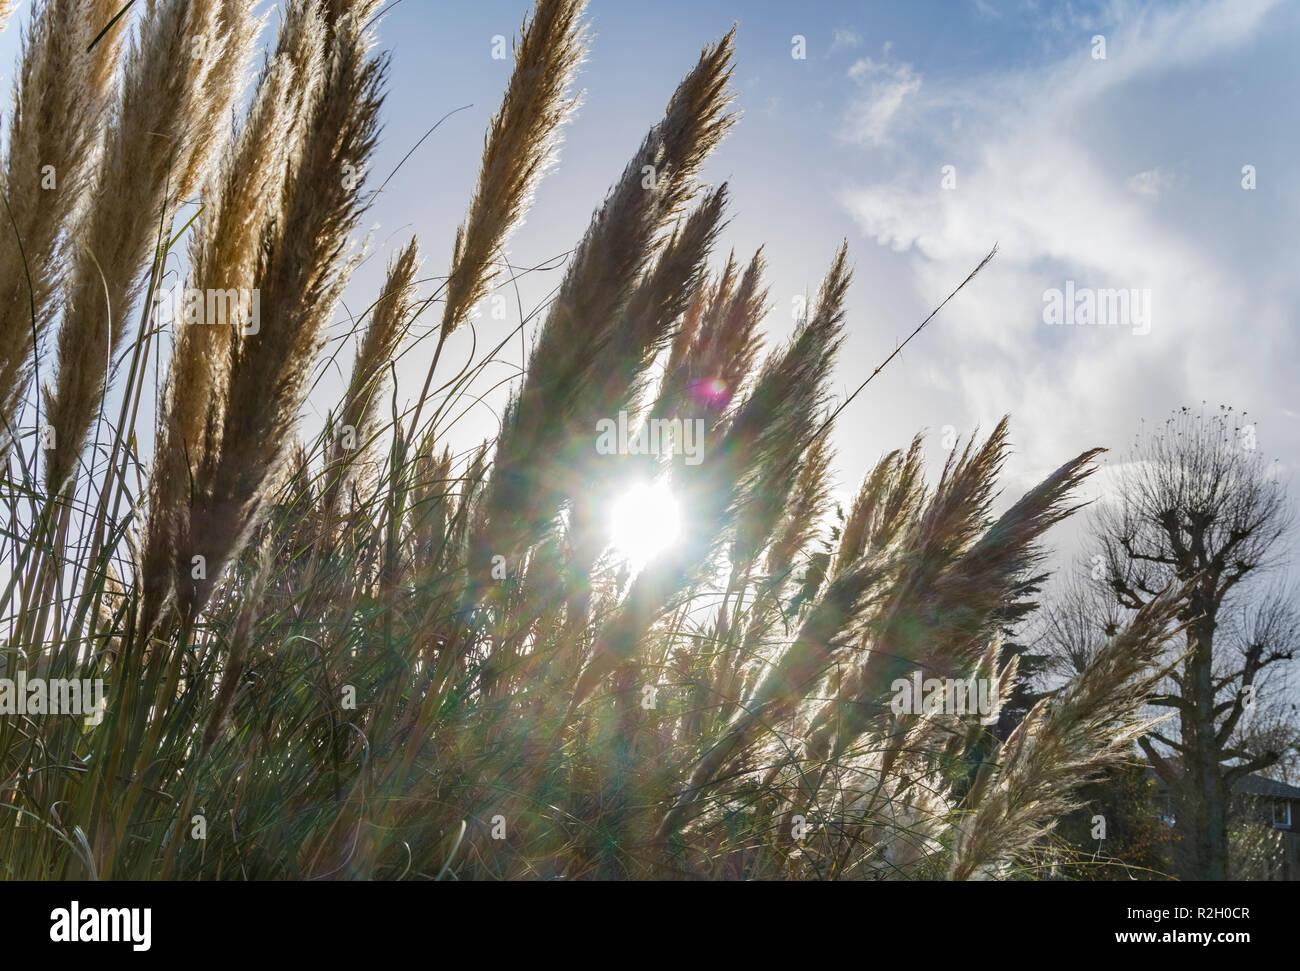 Low sun shining through Pampas Grass (Cortaderia selloana) in Autumn in the UK. - Stock Image